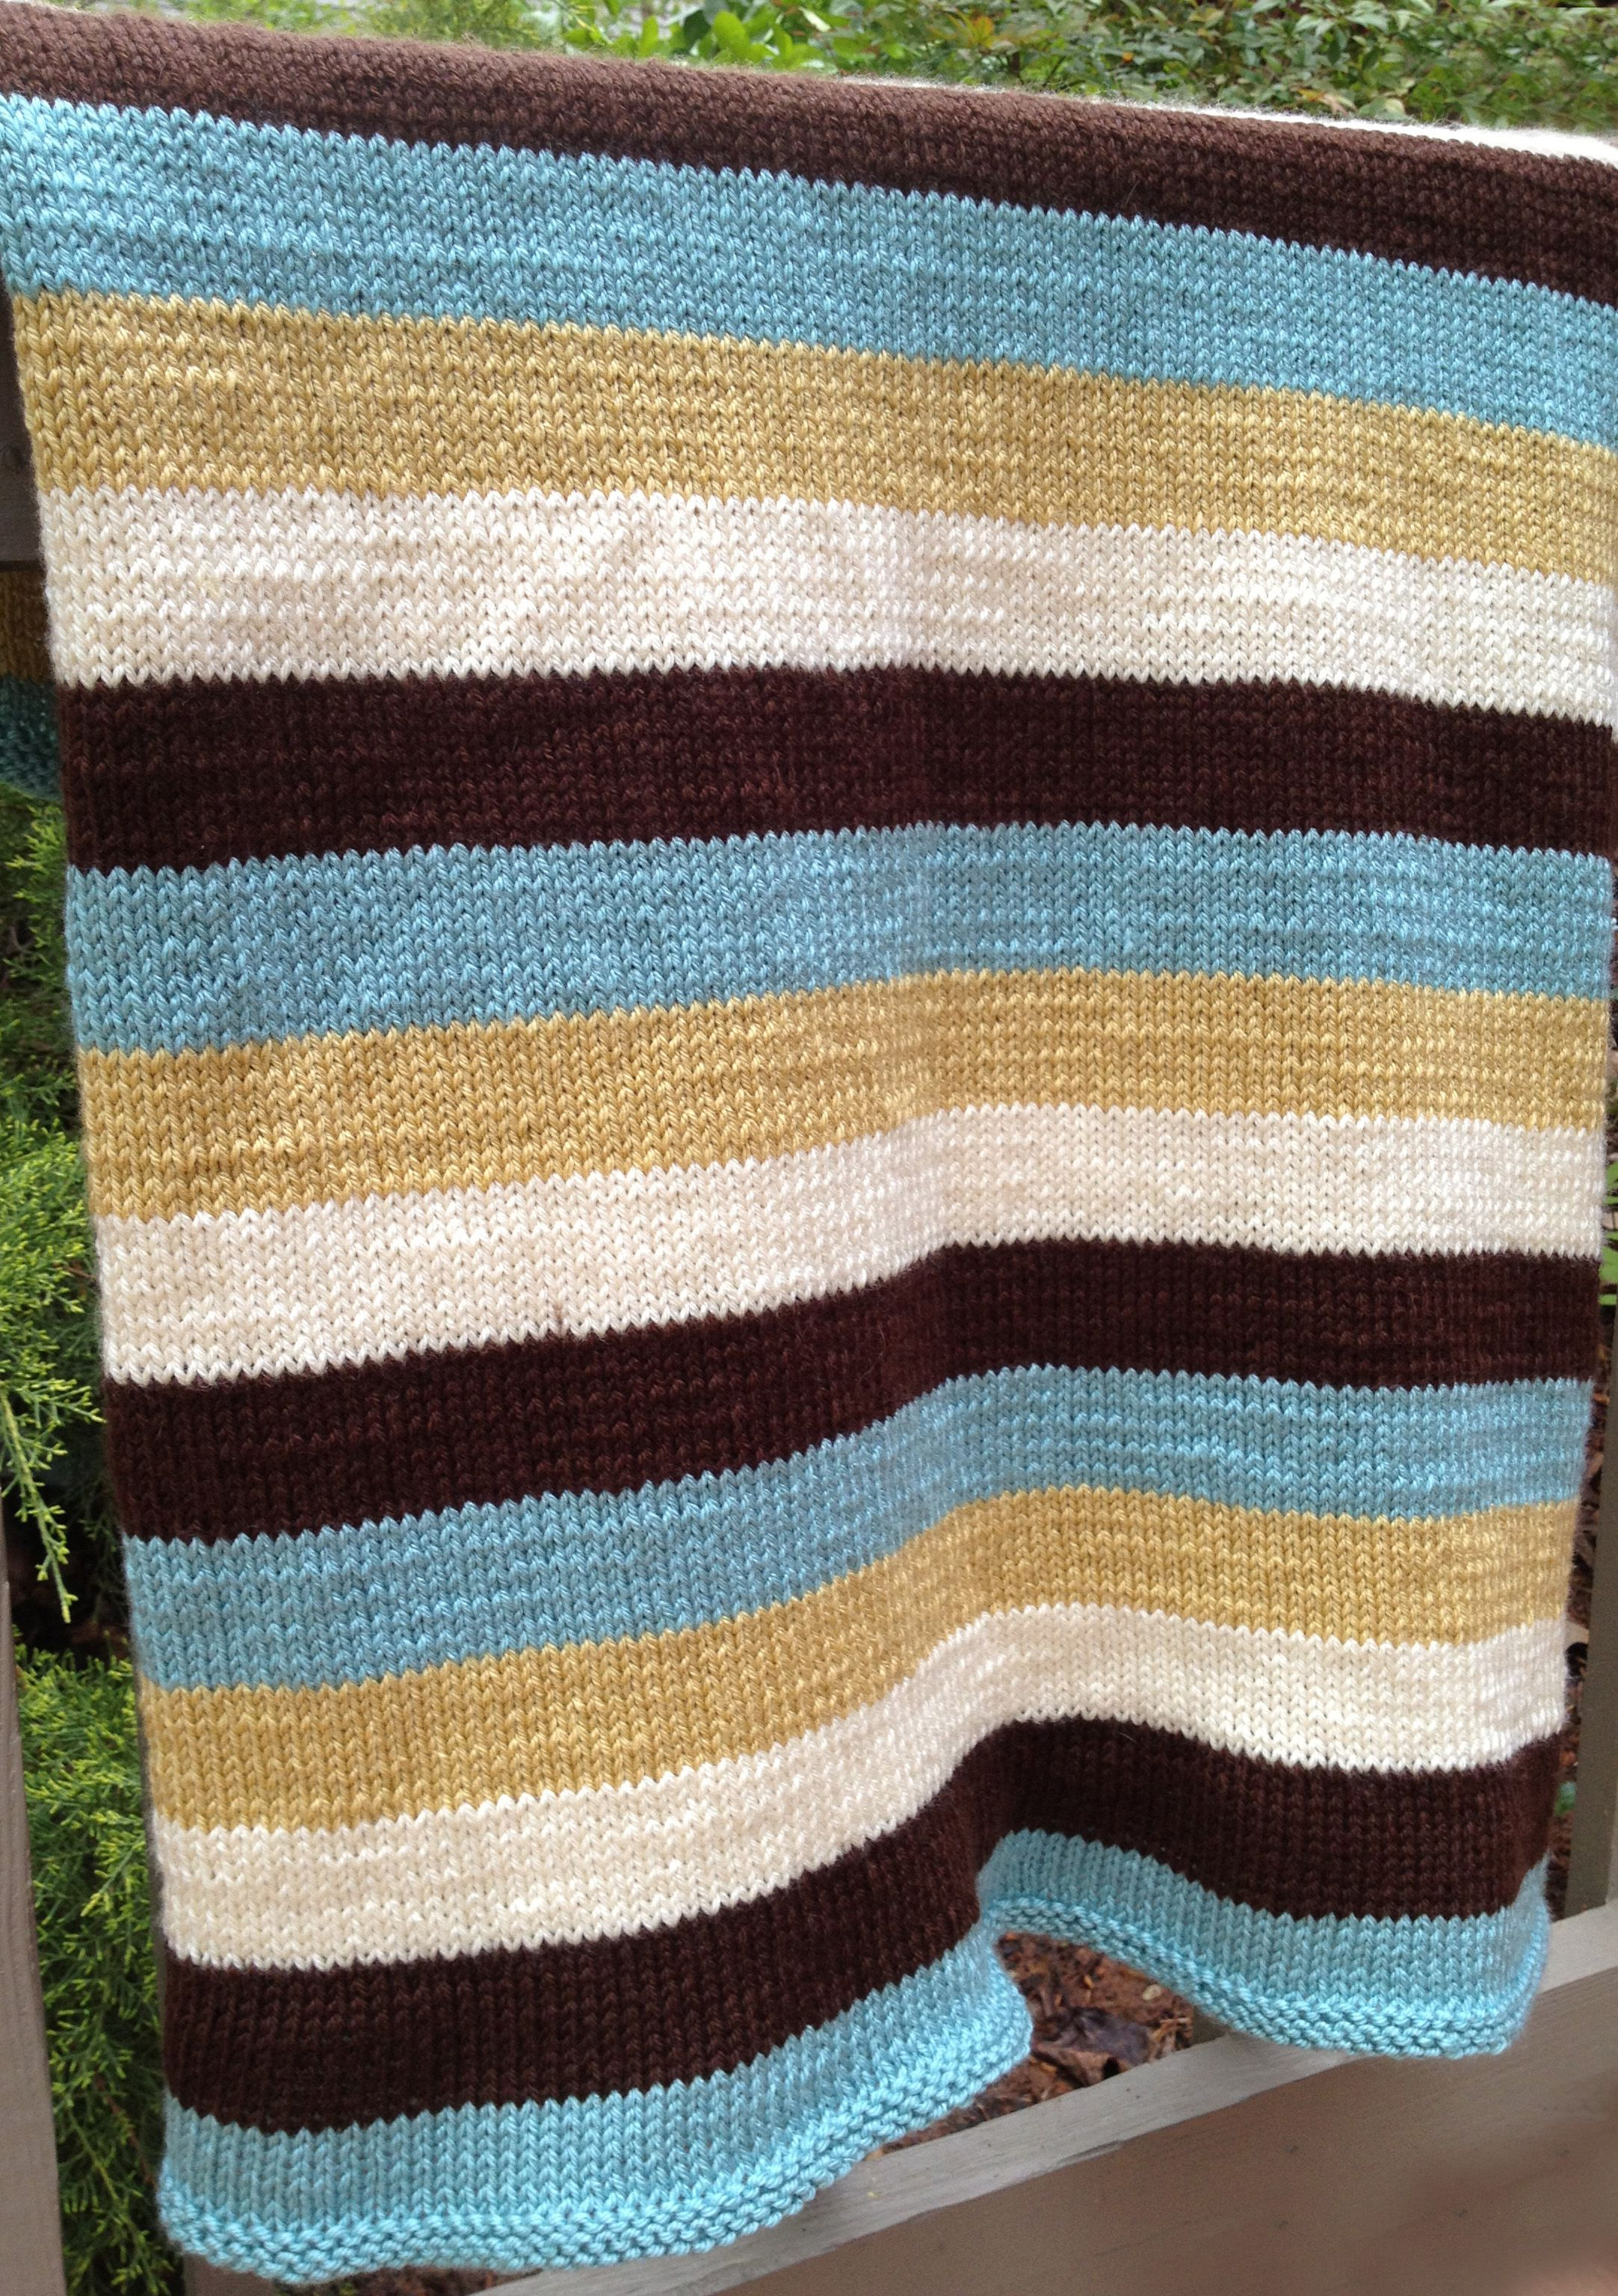 Authentic Knitting Board Striped Blanket #knit #pattern | Knitting ...